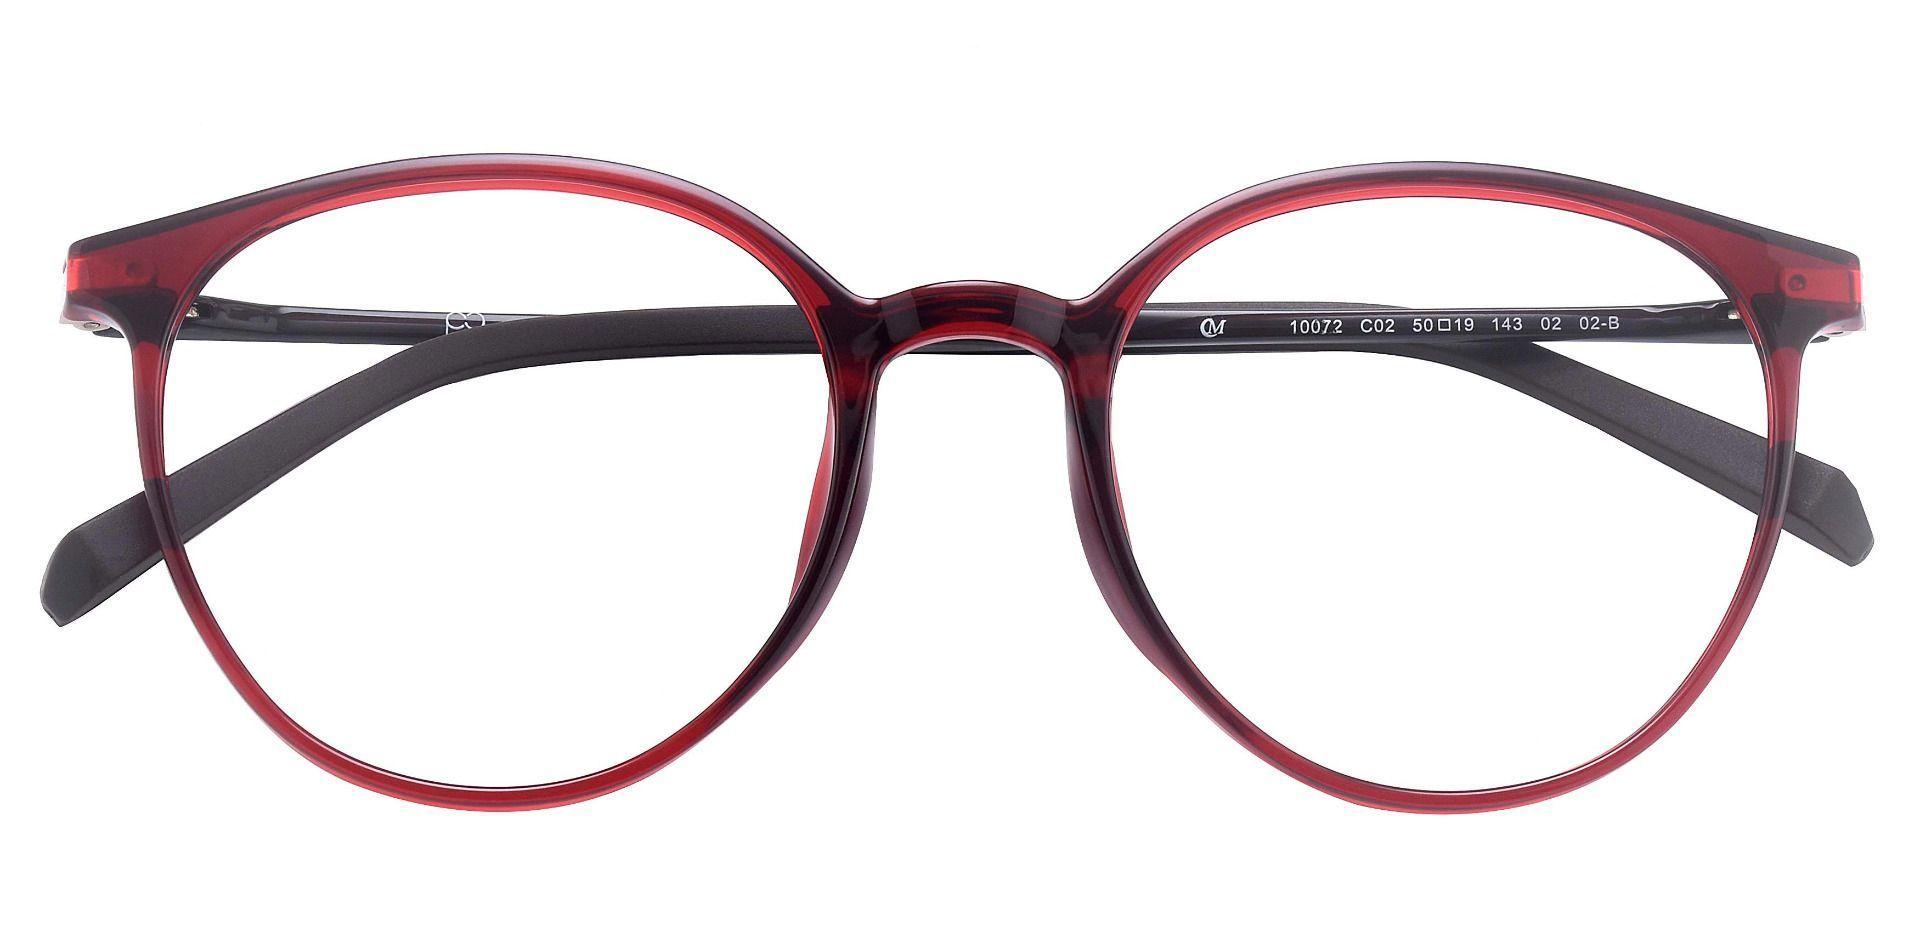 Adelaide Oval Prescription Glasses - Red